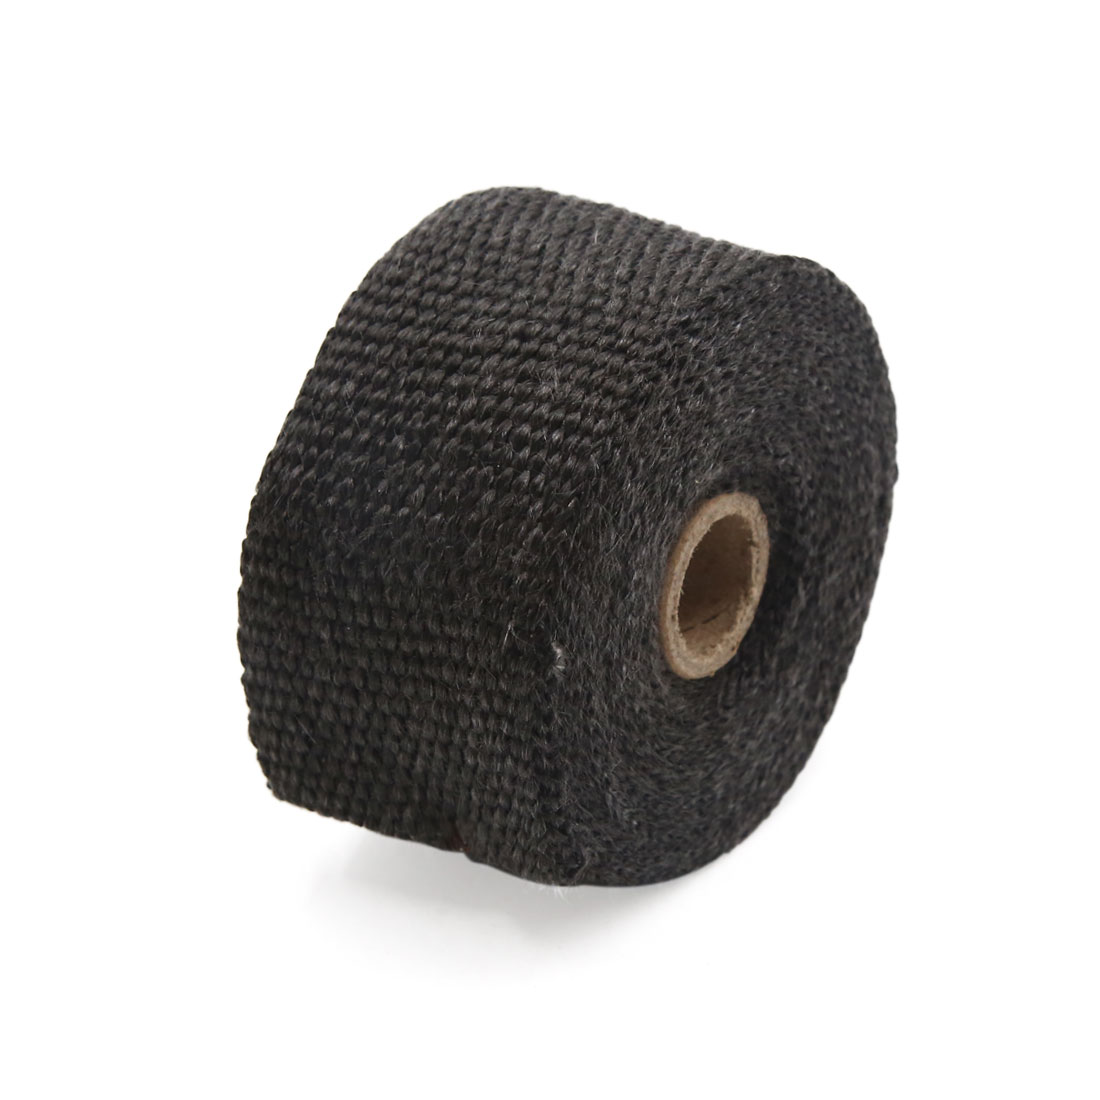 Black Fiberglass Exhaust Pipe Wrap Tape Turbo Heat Insulation Cloth 10M Long - image 1 de 3